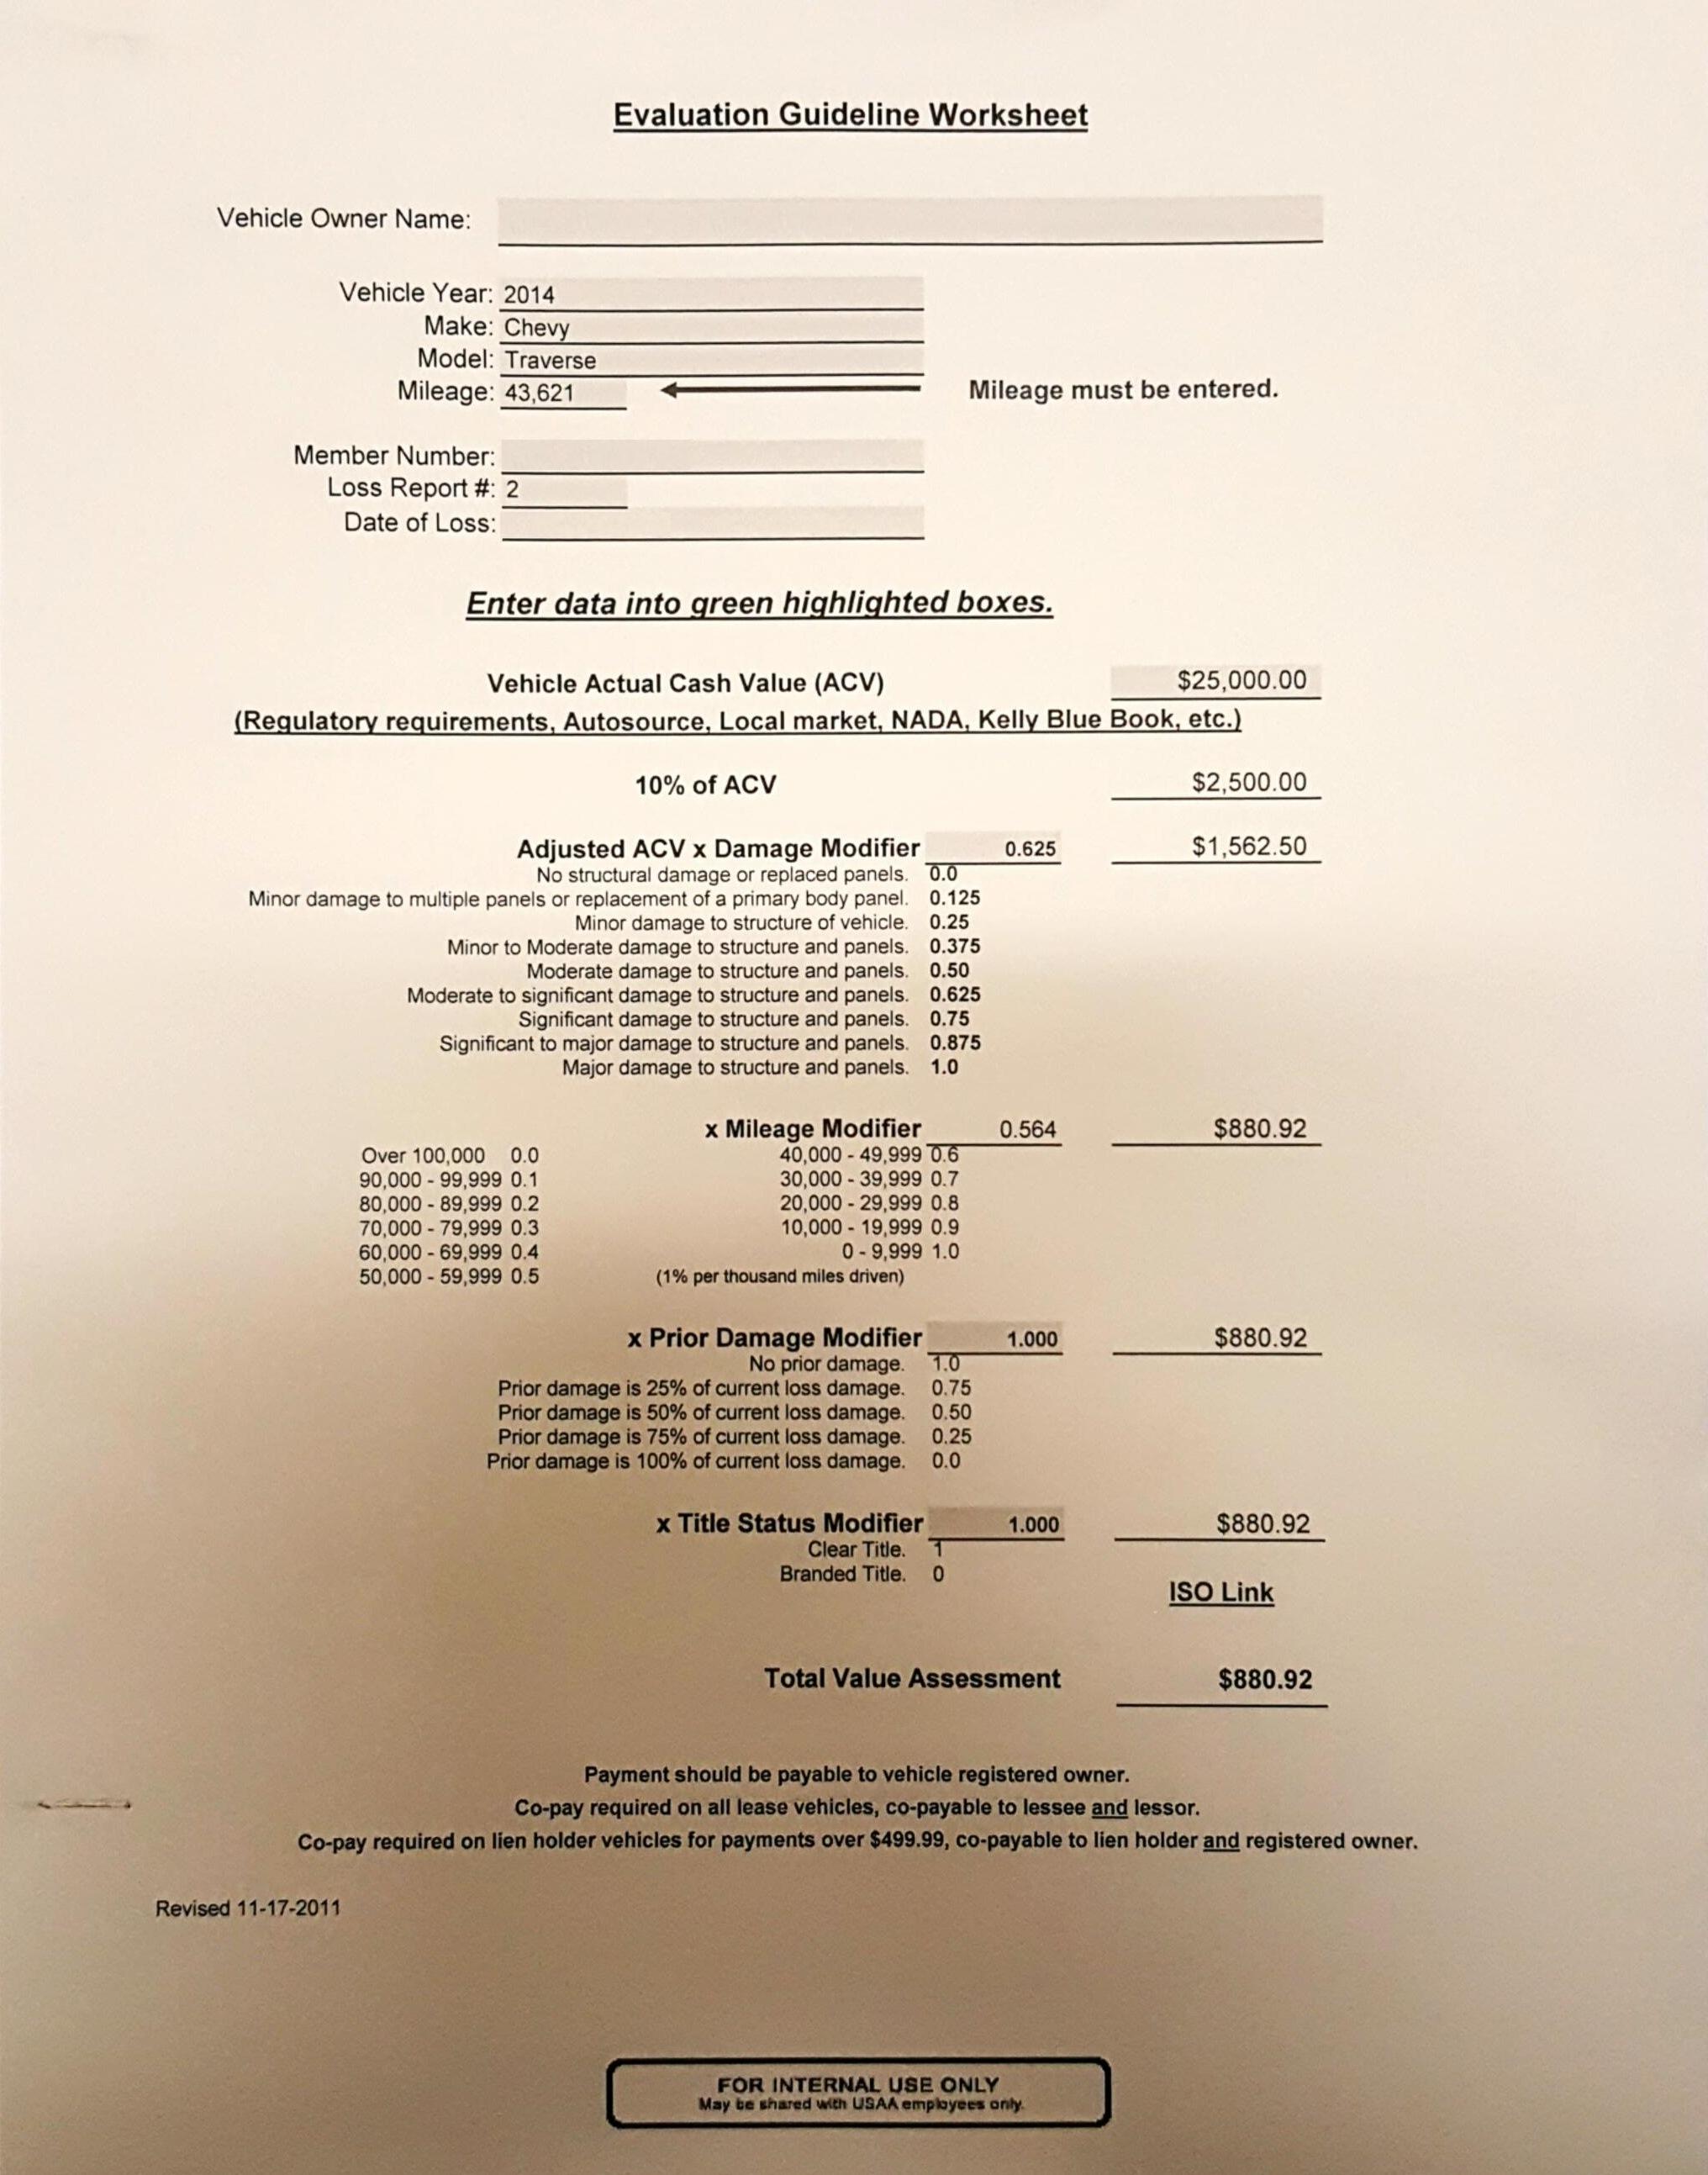 Usaa Evaluation Guideline Worksheet 17c Diminished Value